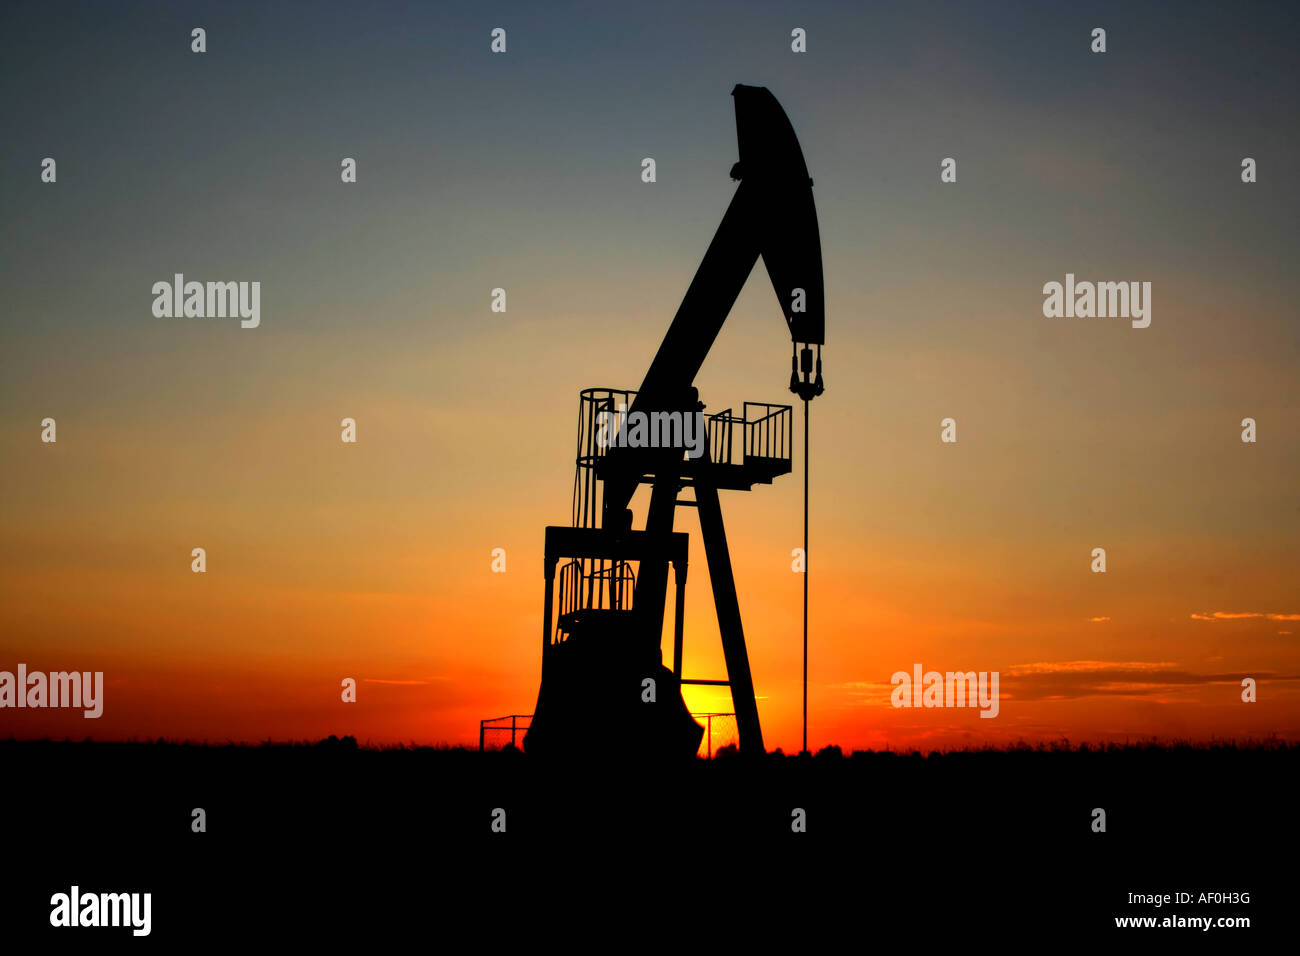 pump jack - Stock Image